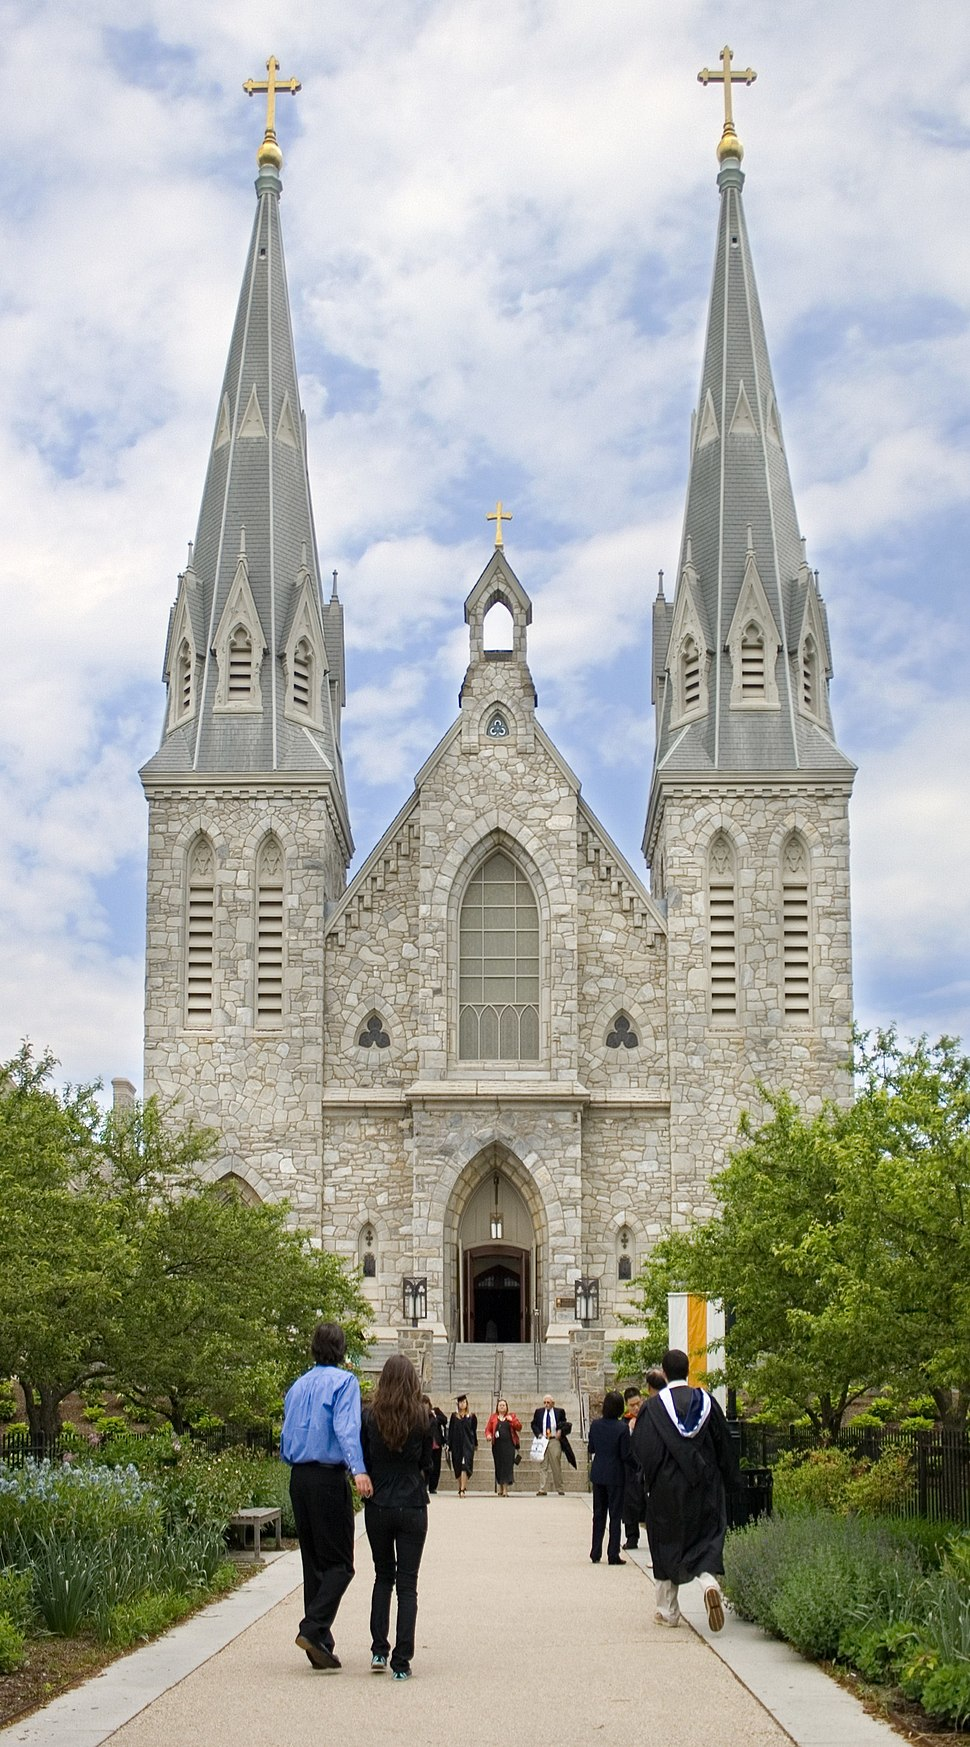 St. Thomas of Villanova Church, on the campus of Villanova University